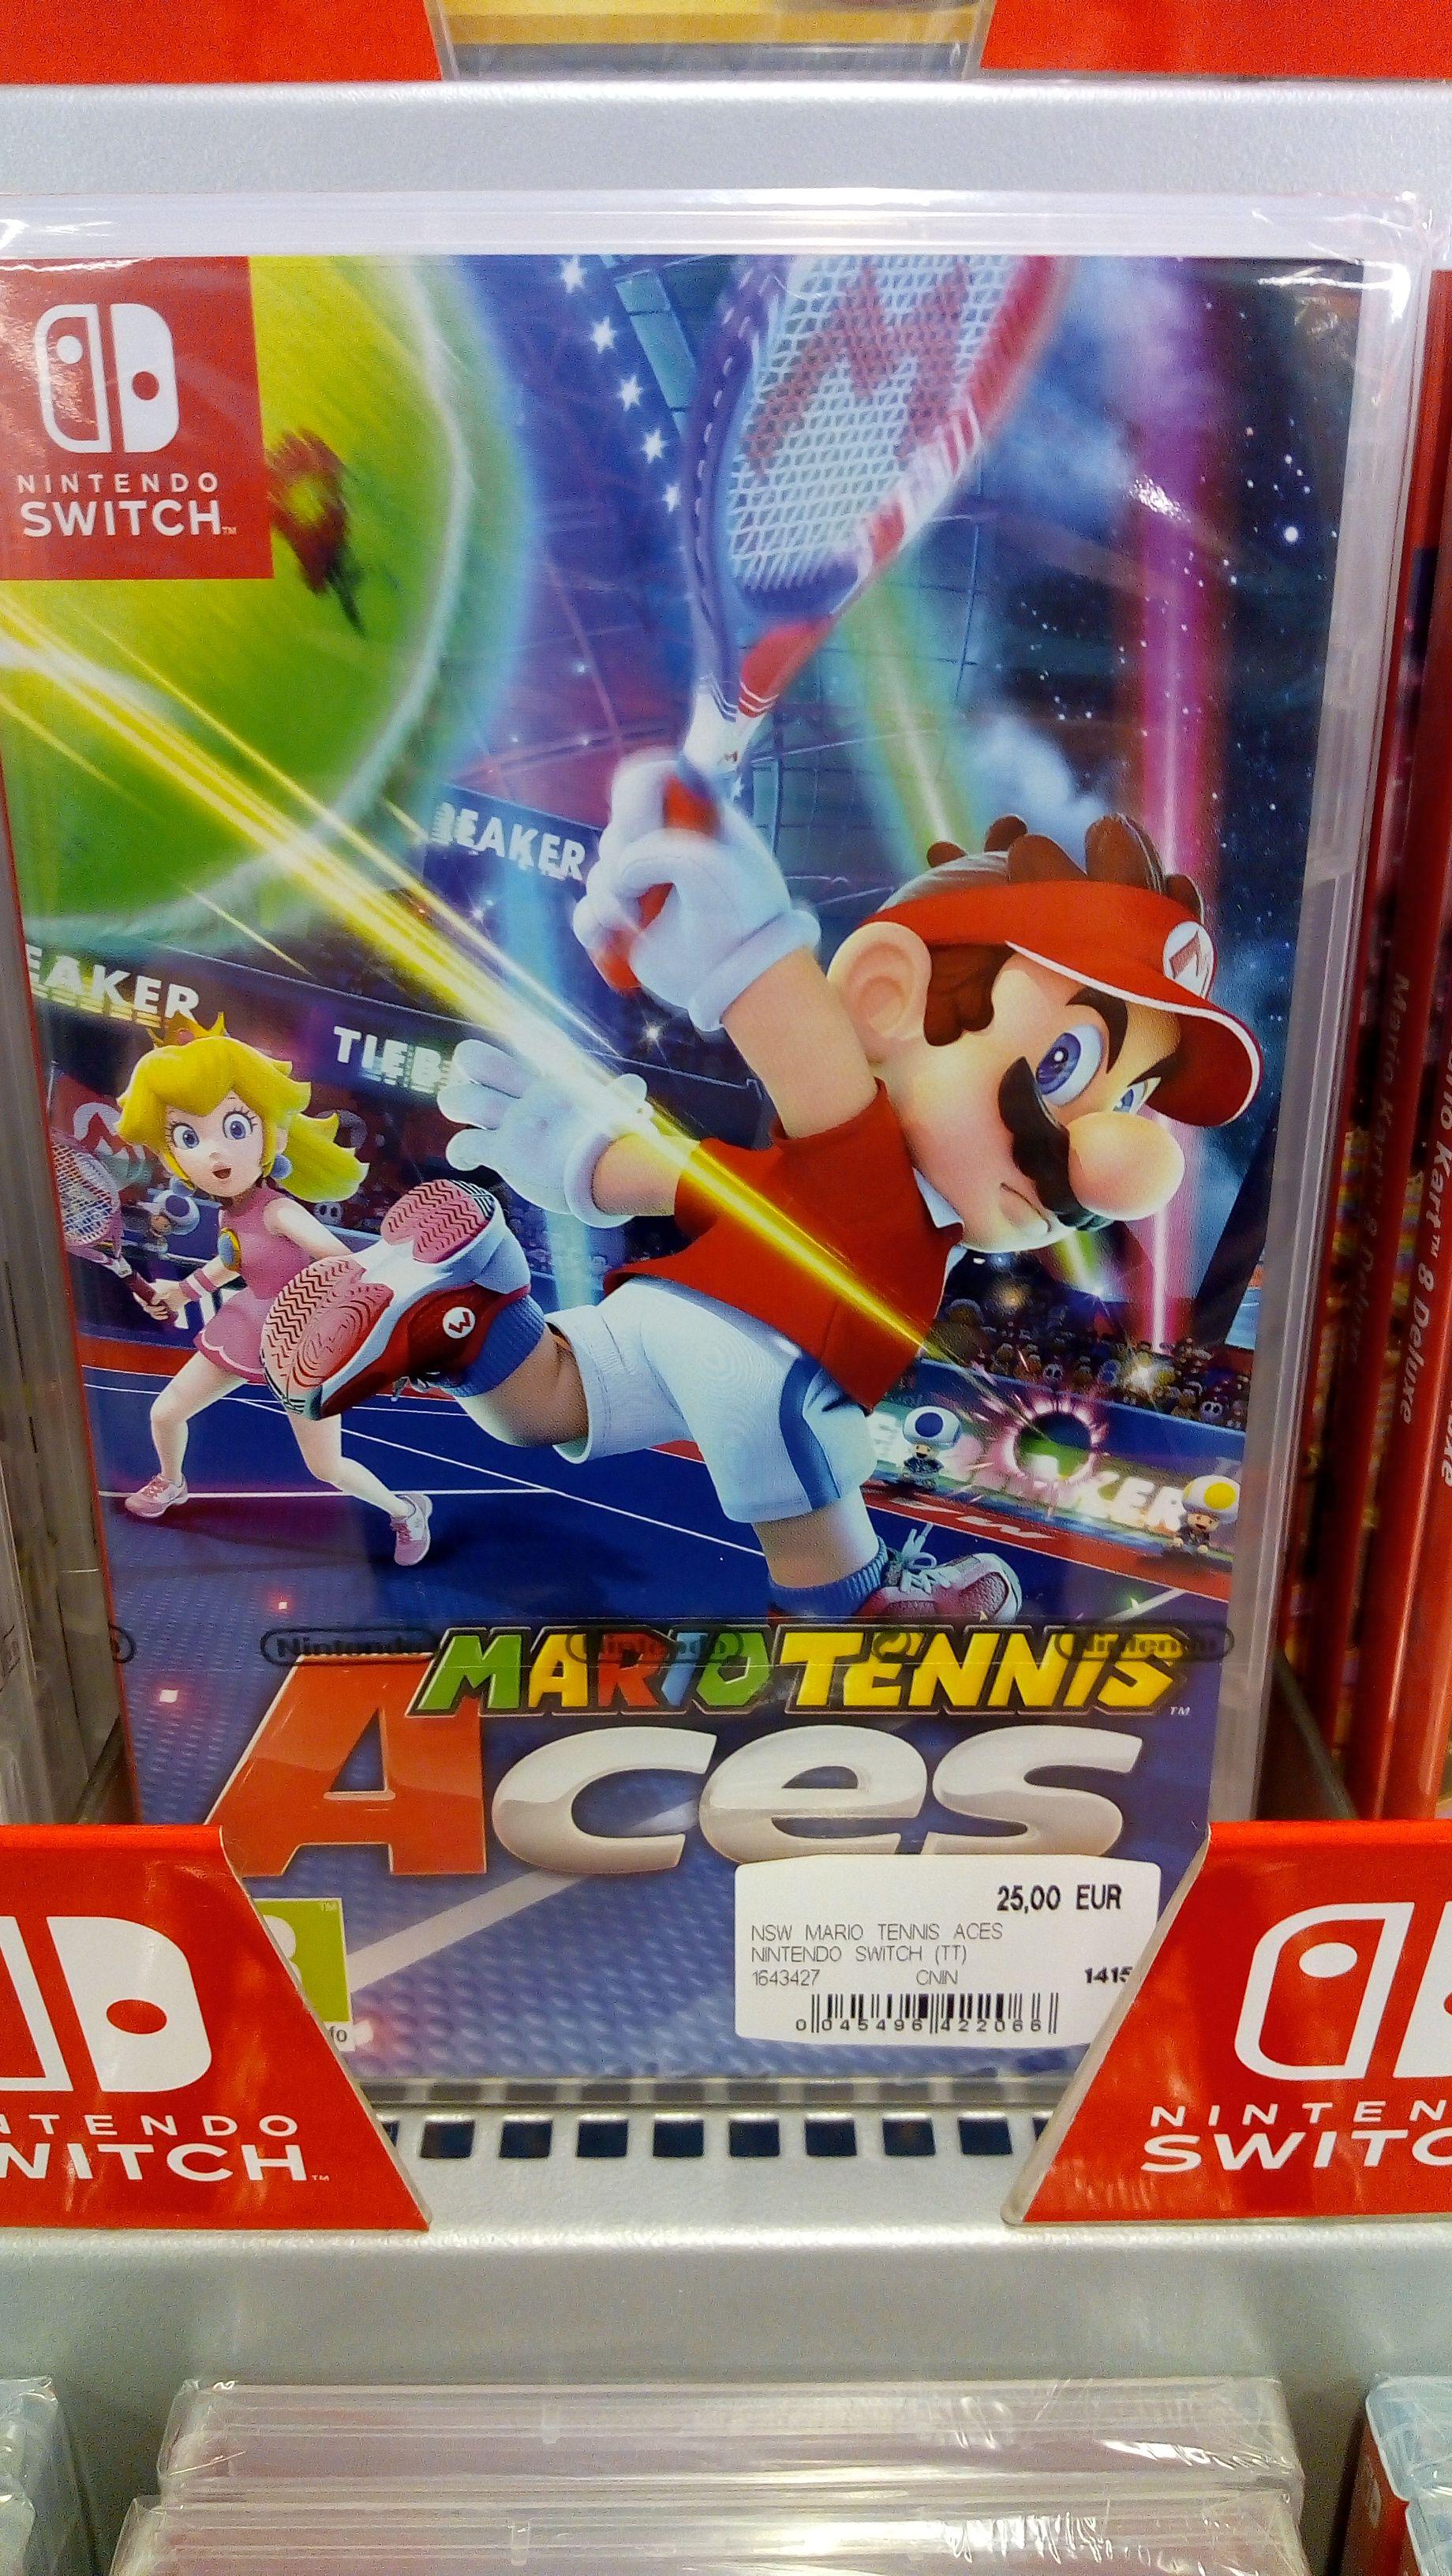 [SaturnHaid] Mario Tennis Aces, Pokemon lets go Evoli oder Pikachu für Switch um je 25 Euro